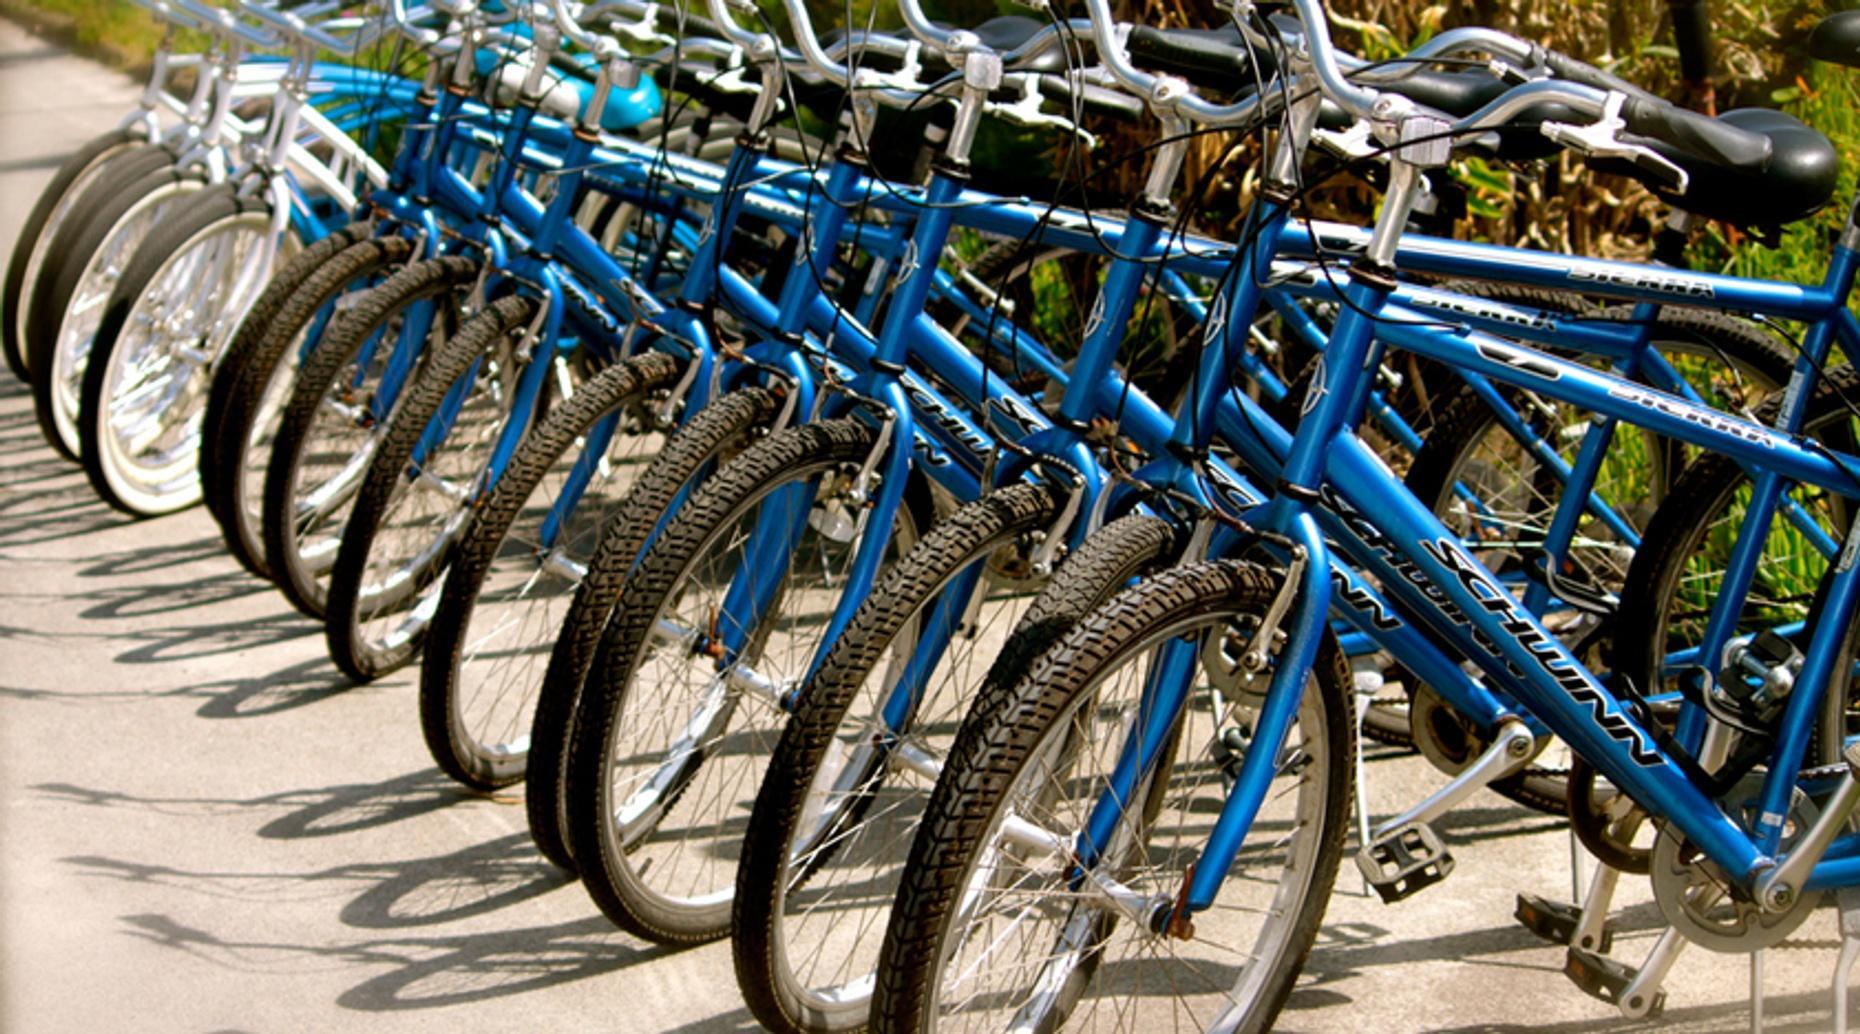 Historical Bike Tour of Cancun